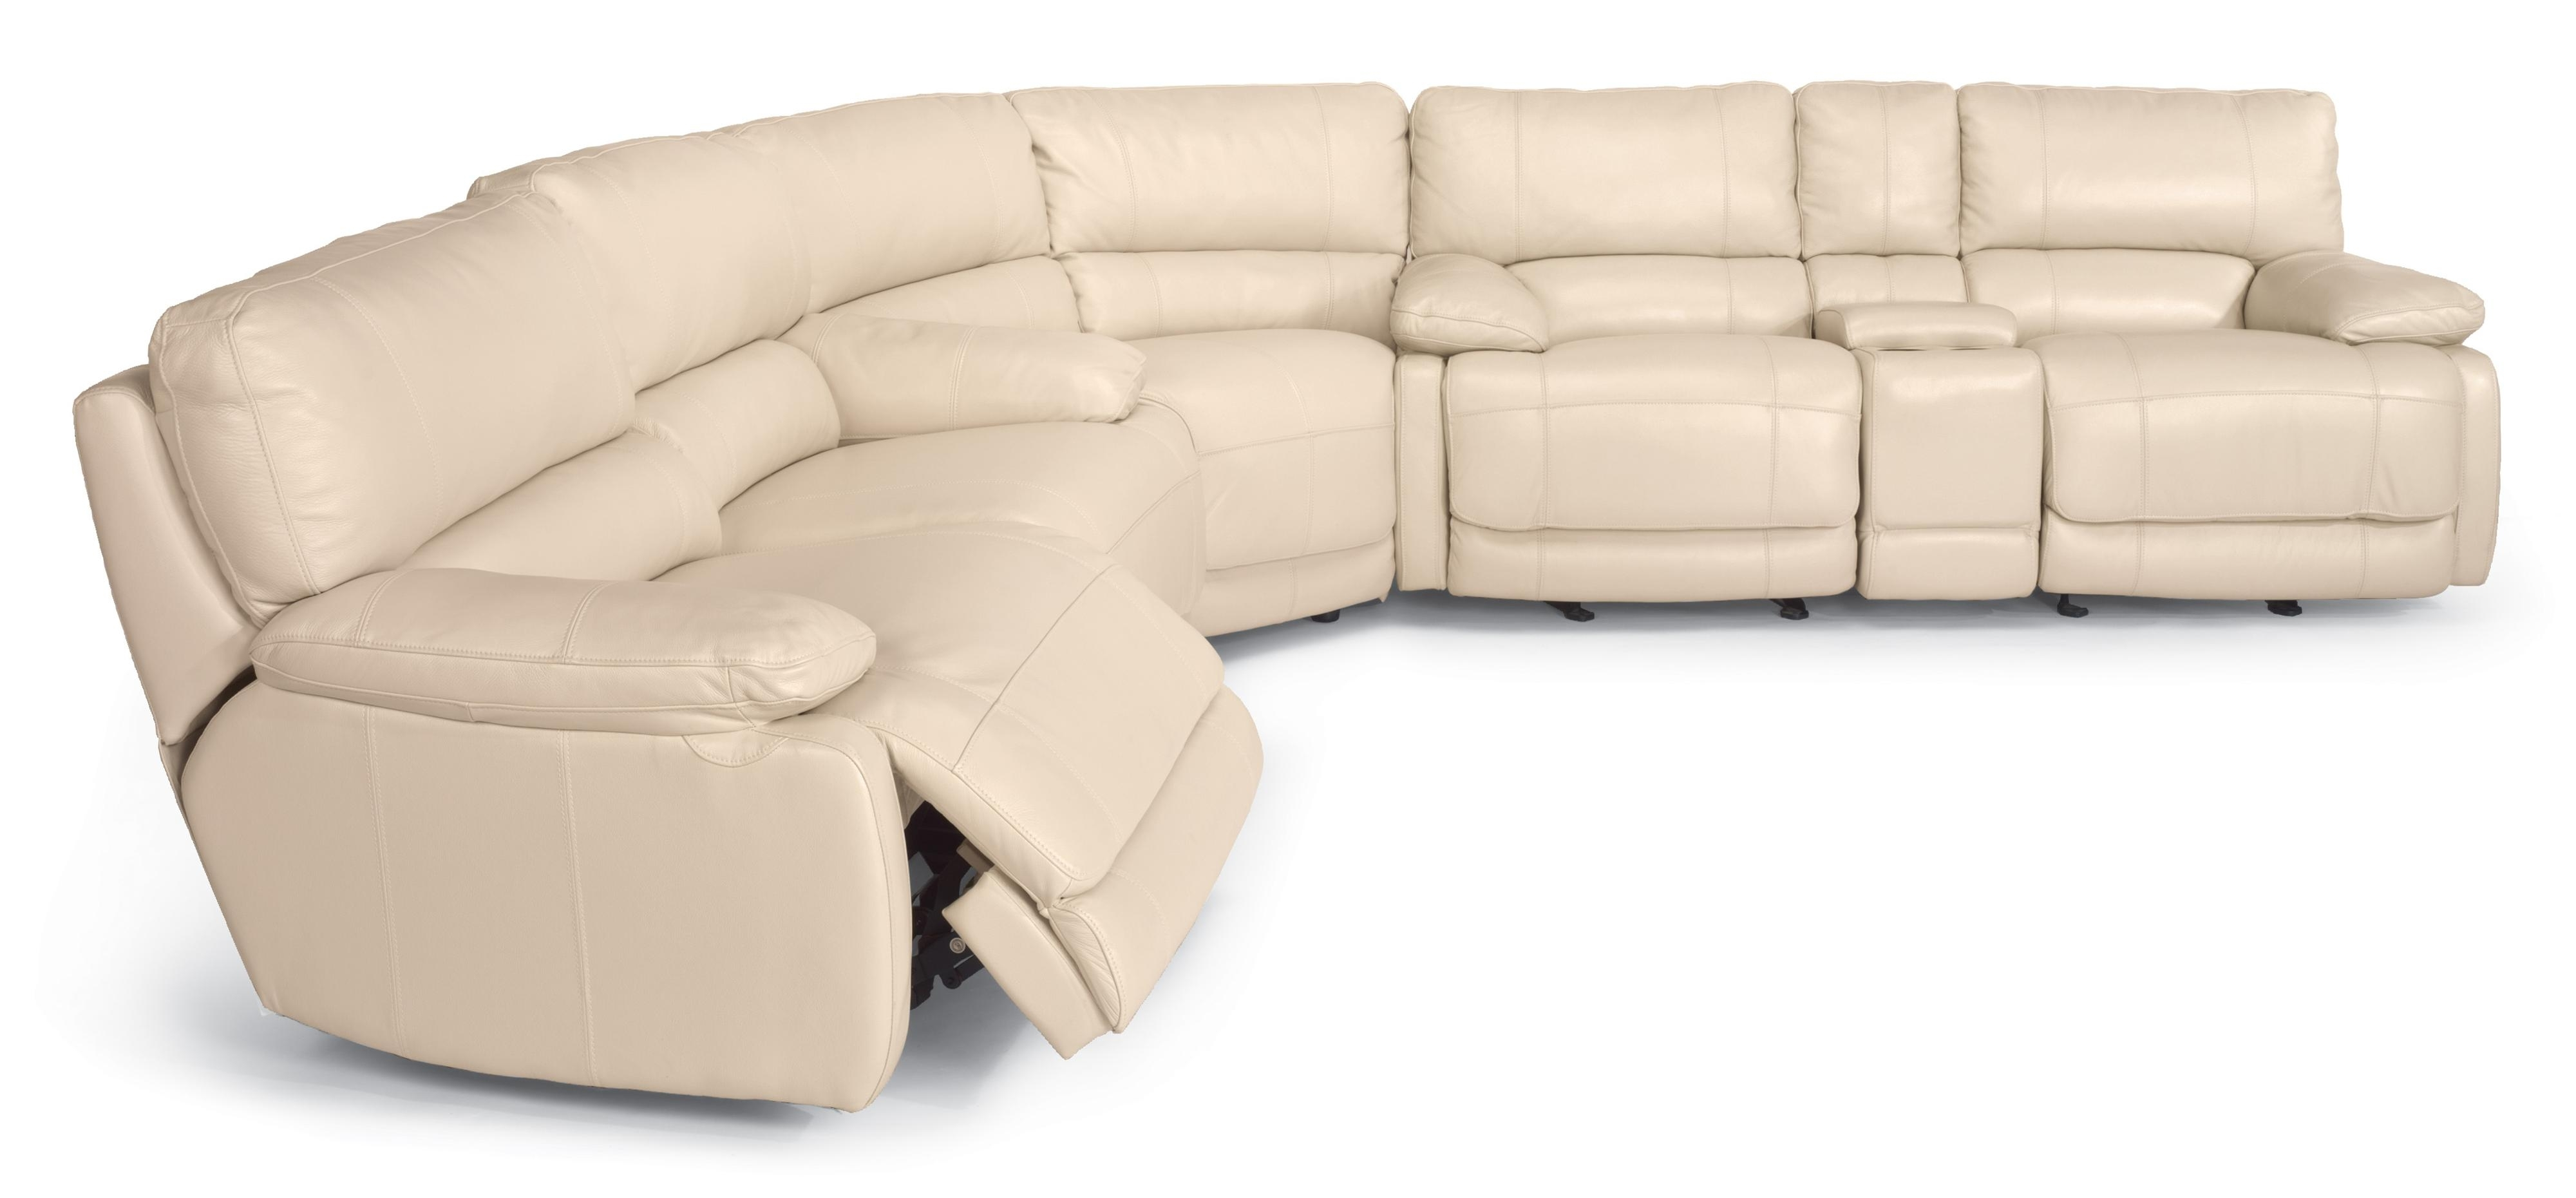 Flexsteel Latitudes – Hermosa Reclining Sectional Sofa – Ahfa With Kansas City Mo Sectional Sofas (Image 4 of 10)